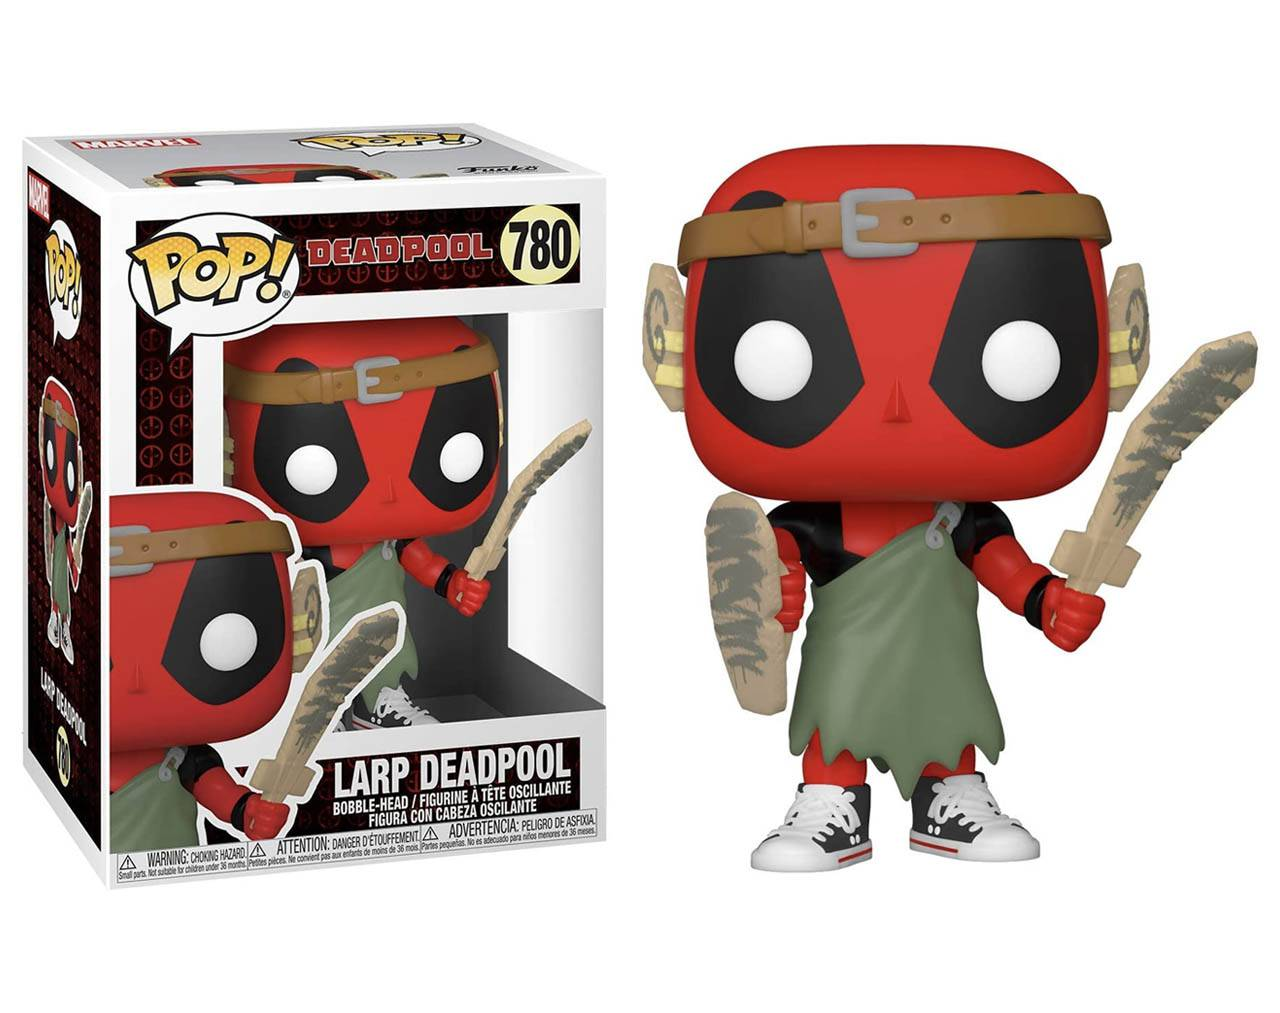 Larp Deadpool (30th Anniversary) Pop! Vinyl